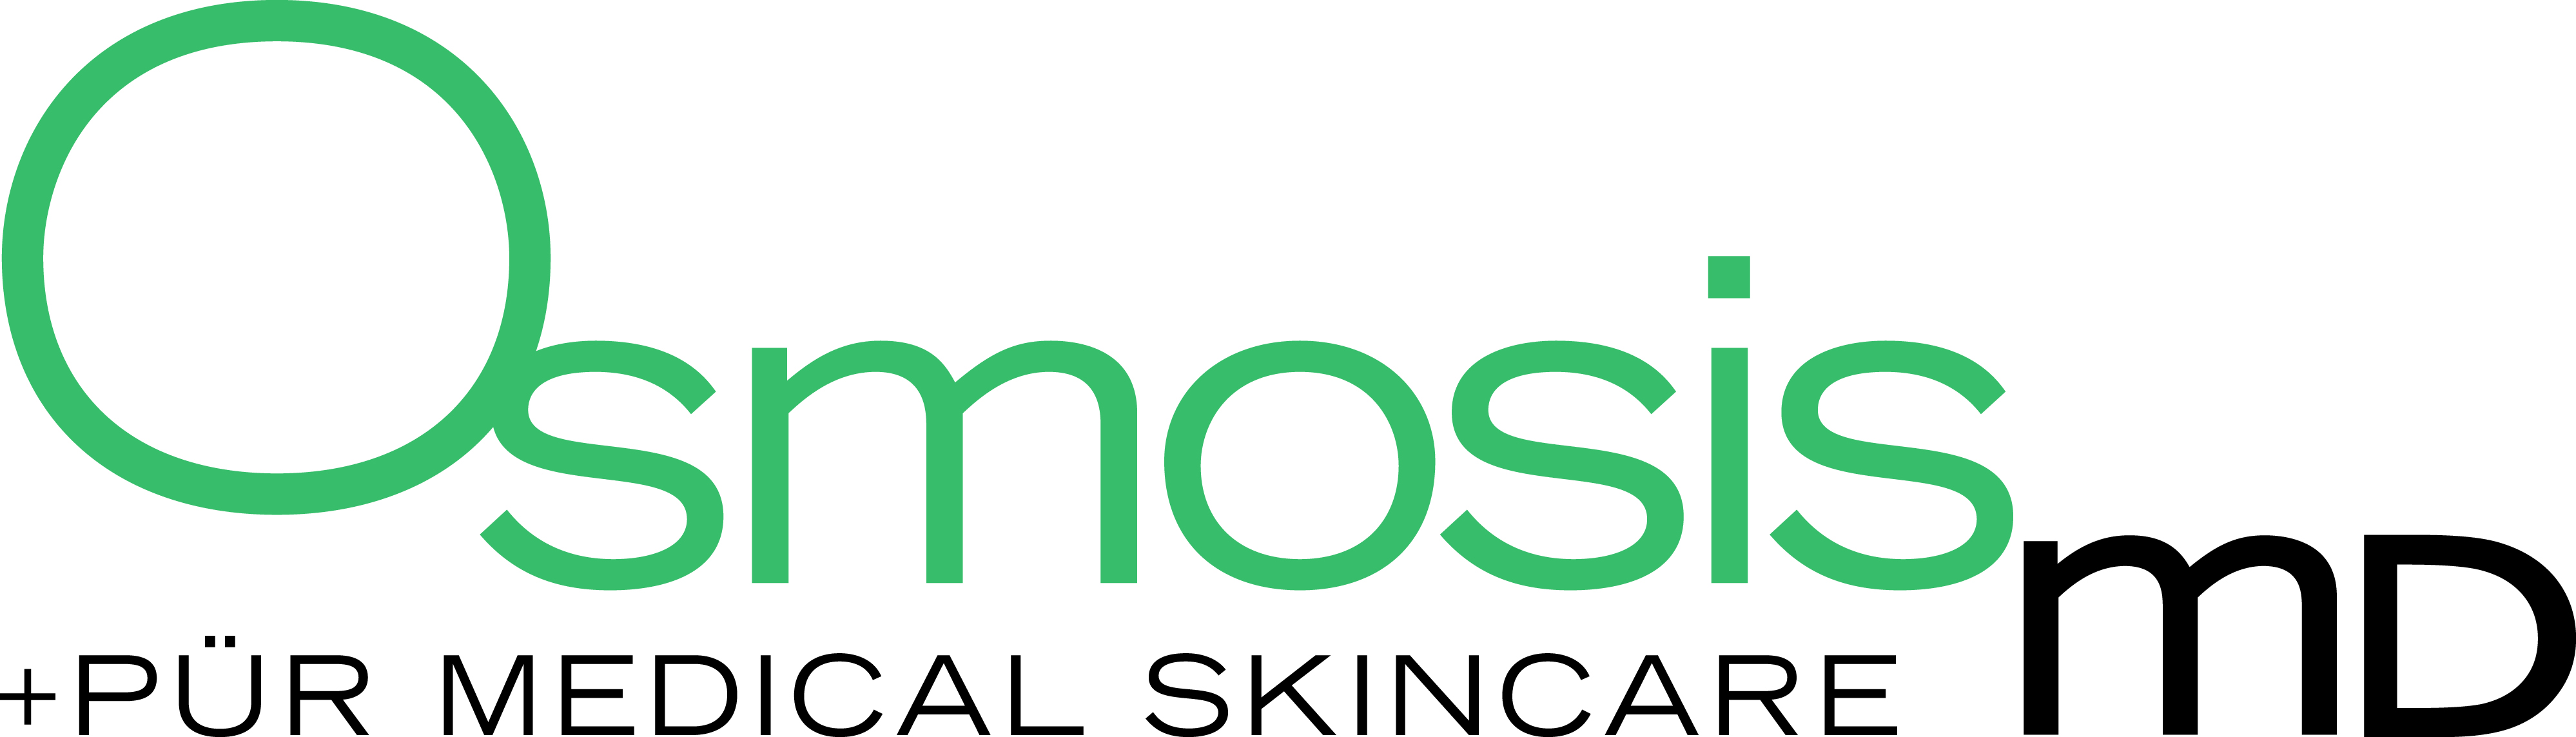 osmosis_md_logo